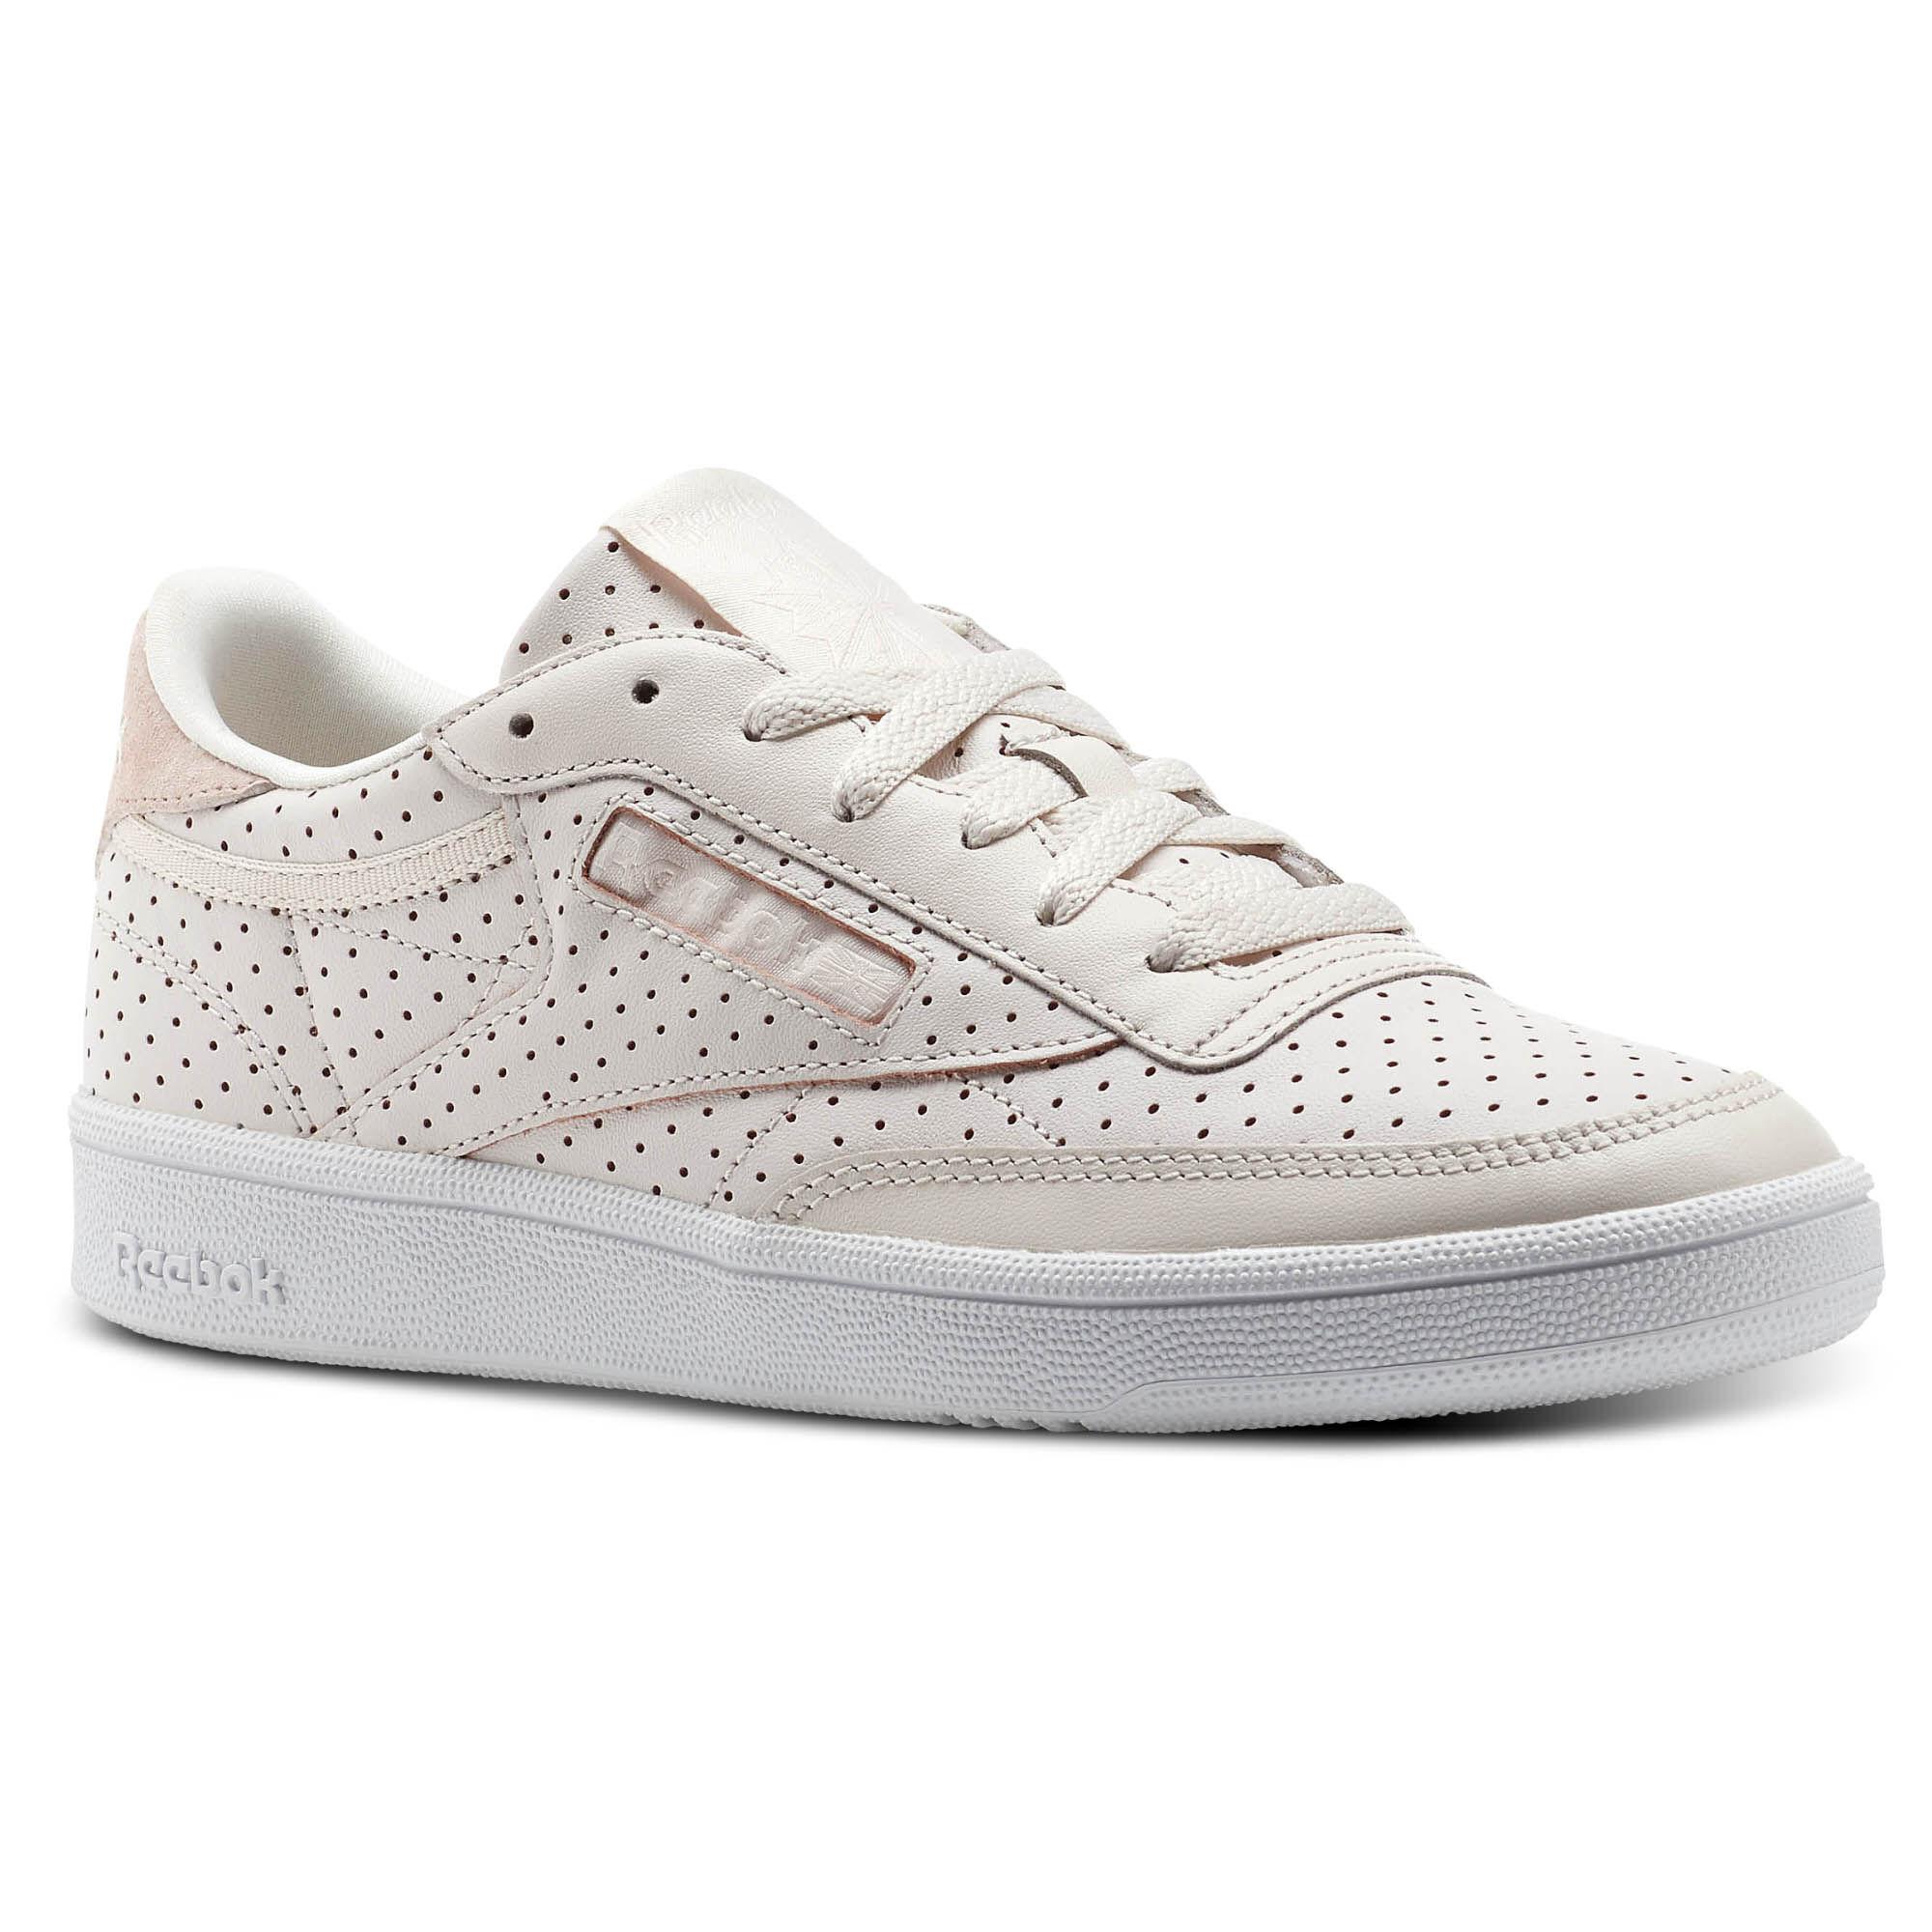 Womens Club C 85 FVS Ps Desert Low-Top Sneakers Reebok sxyIyLp